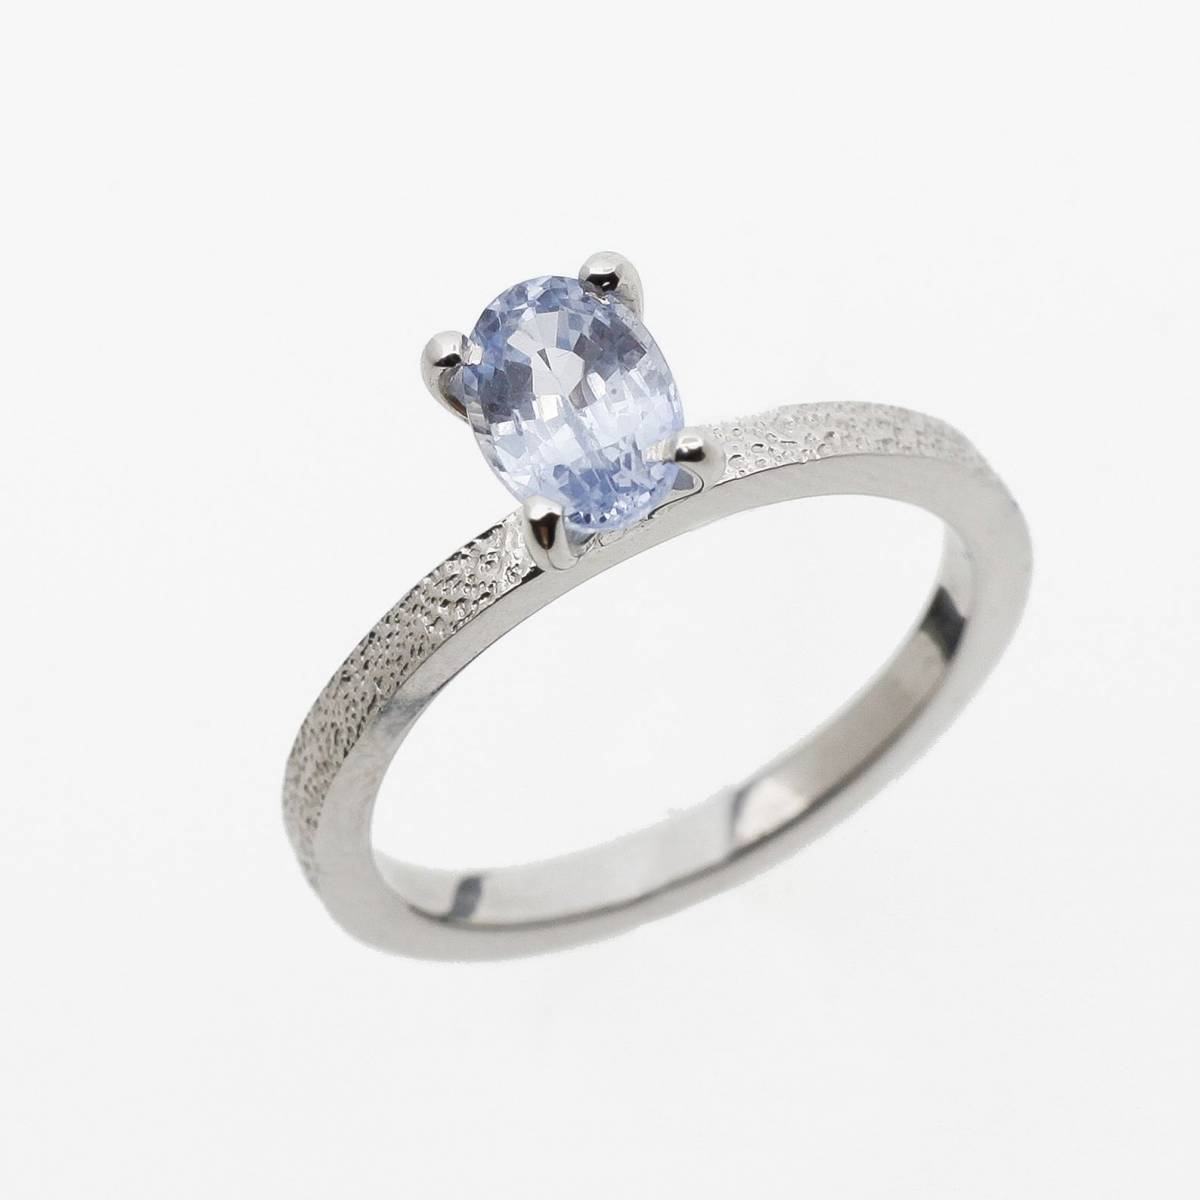 Jonas Maes Jewels - Juwelen - Bruidsjuwelen - Verlovingsring - Trouwring - House of Weddings - 20